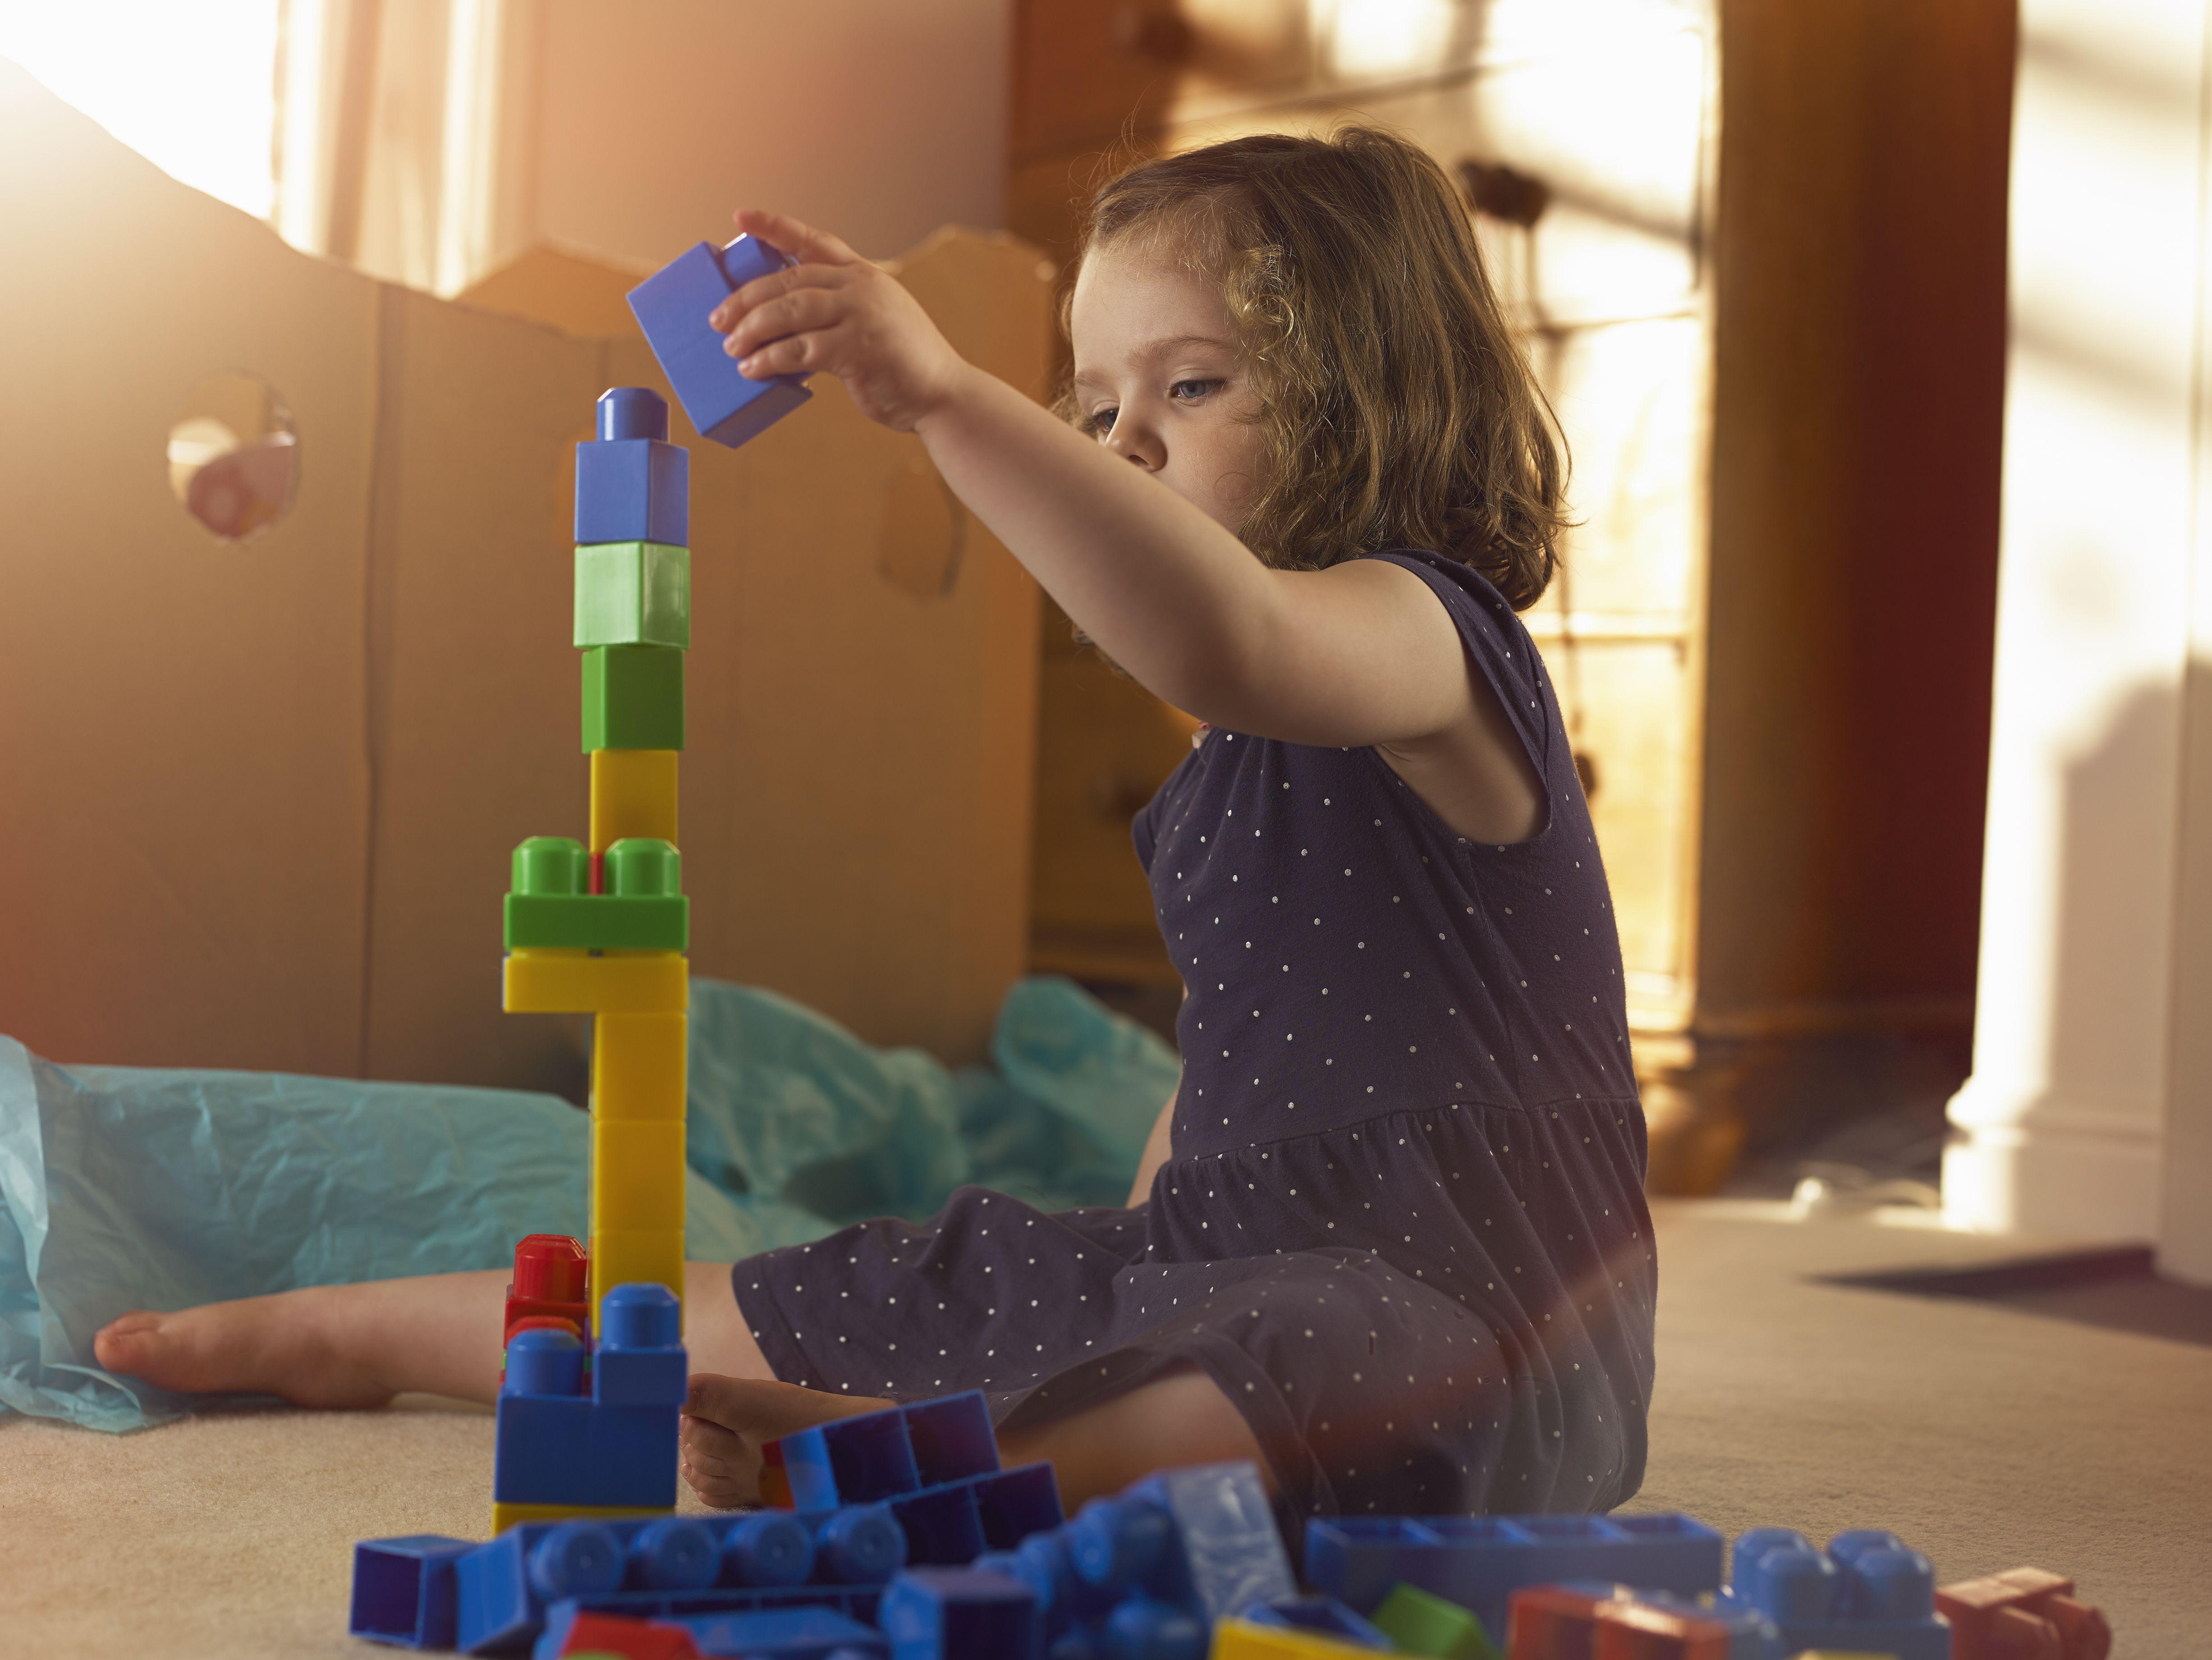 3 year old girl stacking blocks in bedroom